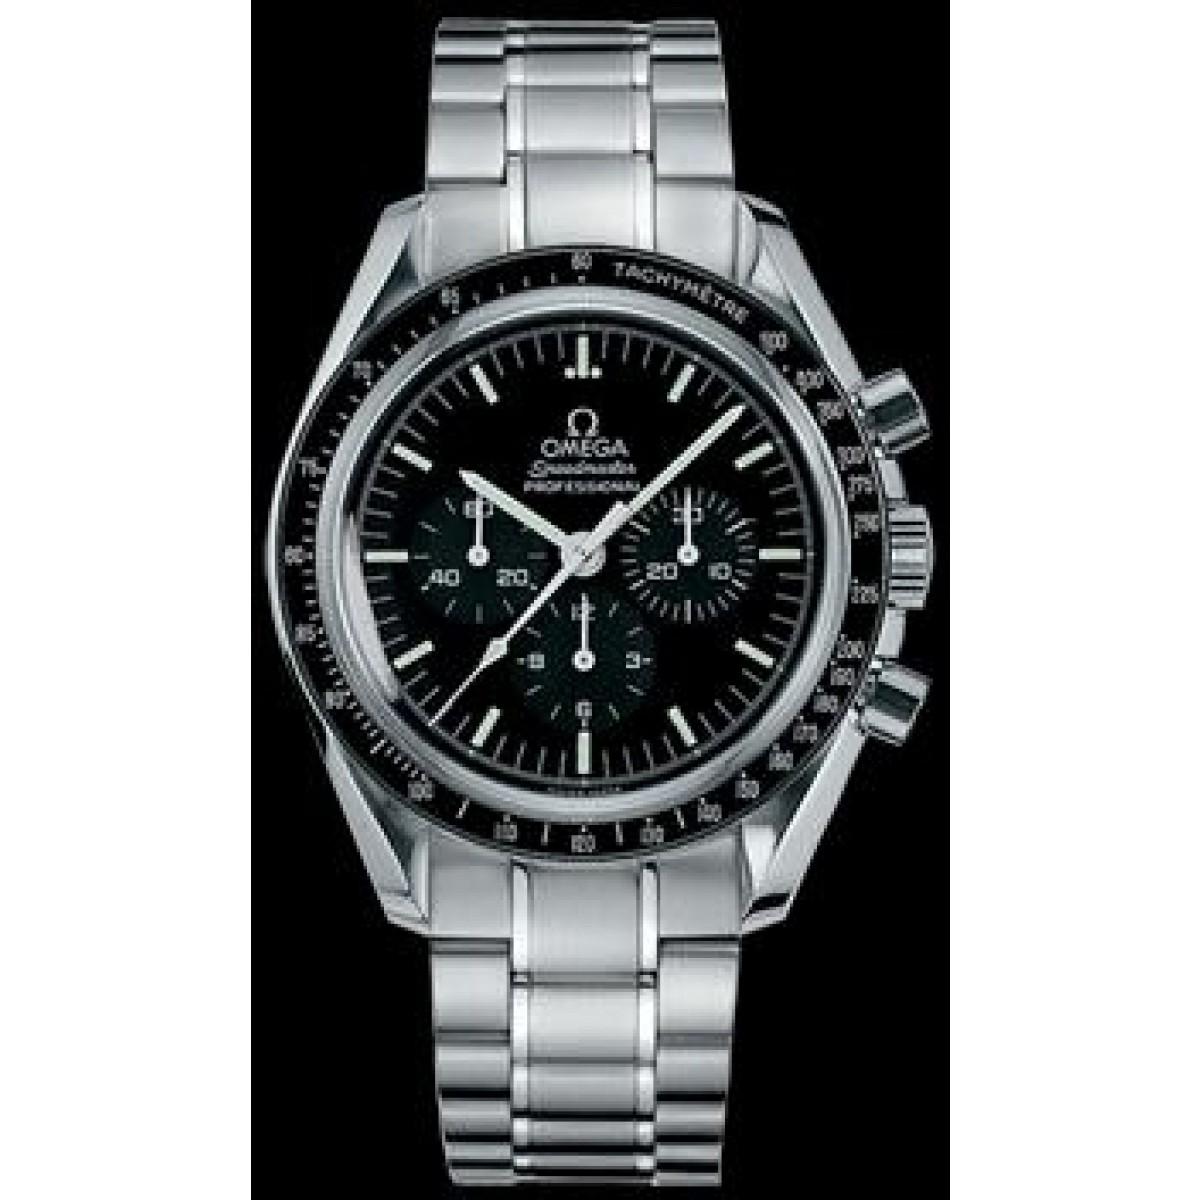 ff243fad583 Espiar · Relógio Réplica Omega Speedmaster